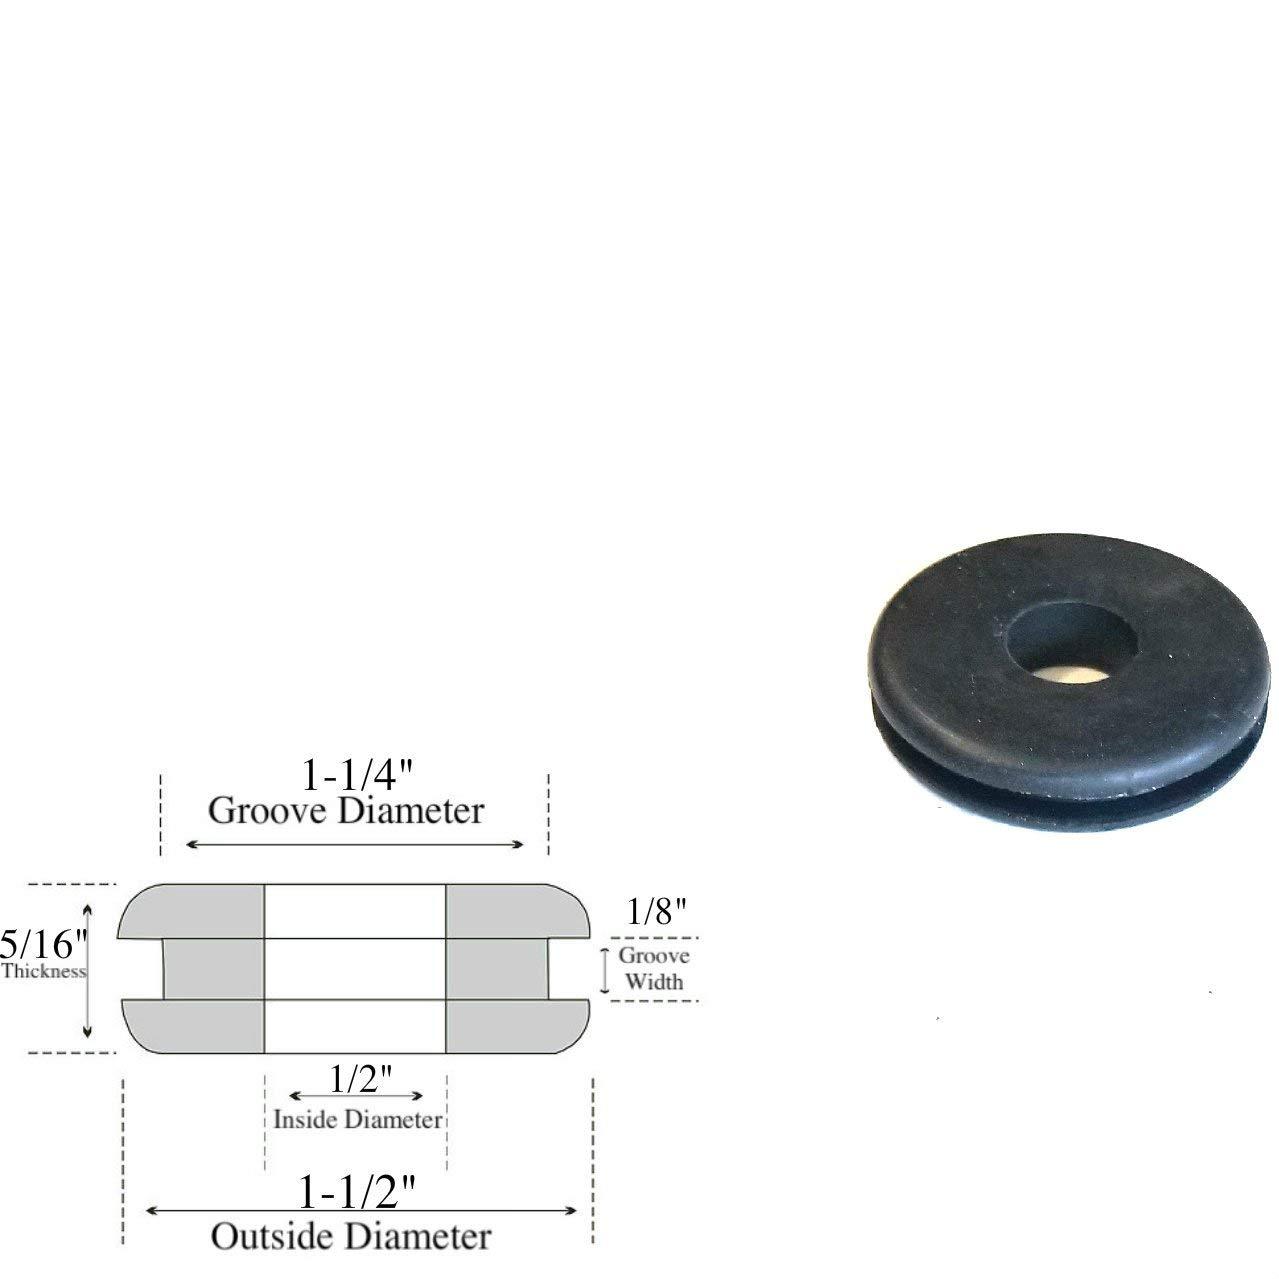 Lot of (25) 1/2'' Inside Diameter Rubber Grommets - 1/8 GW - Fits 1-1/4'' Panel Hole